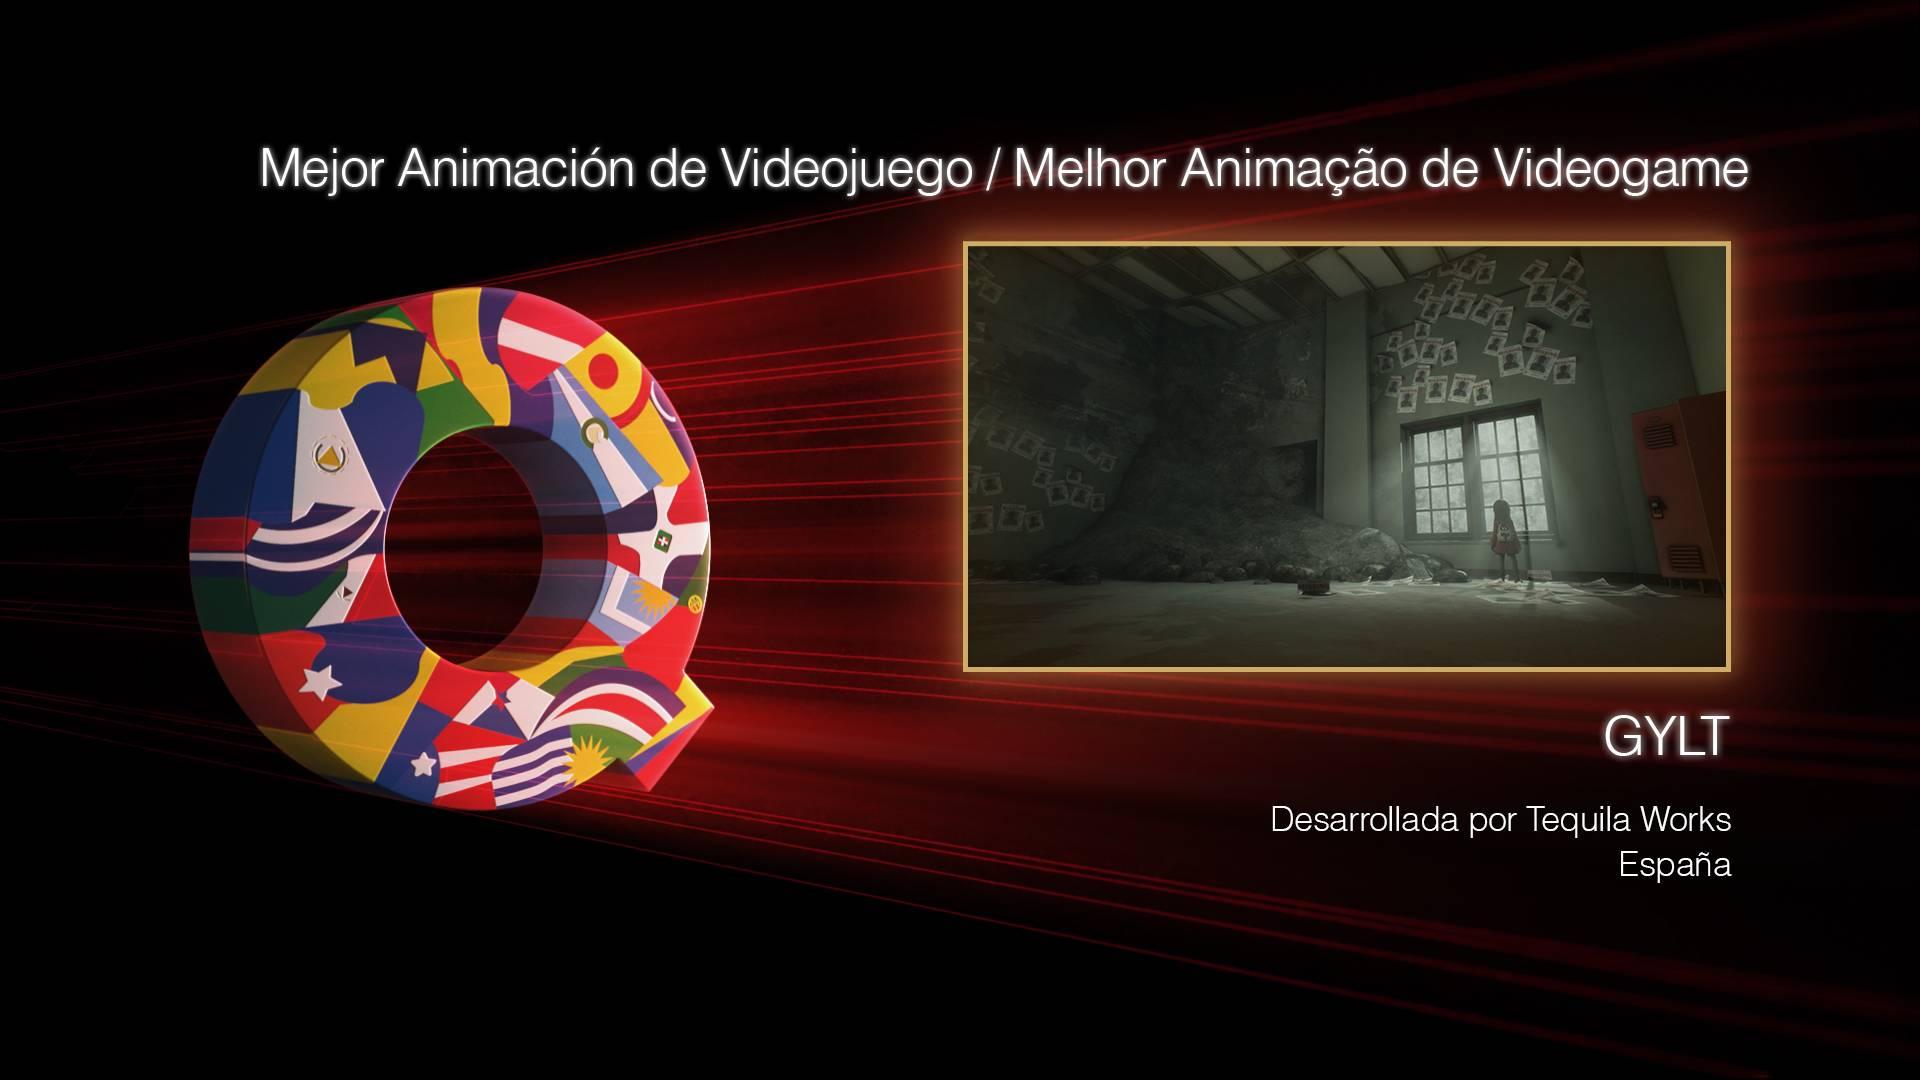 GYLT premios quirino mejor animacion